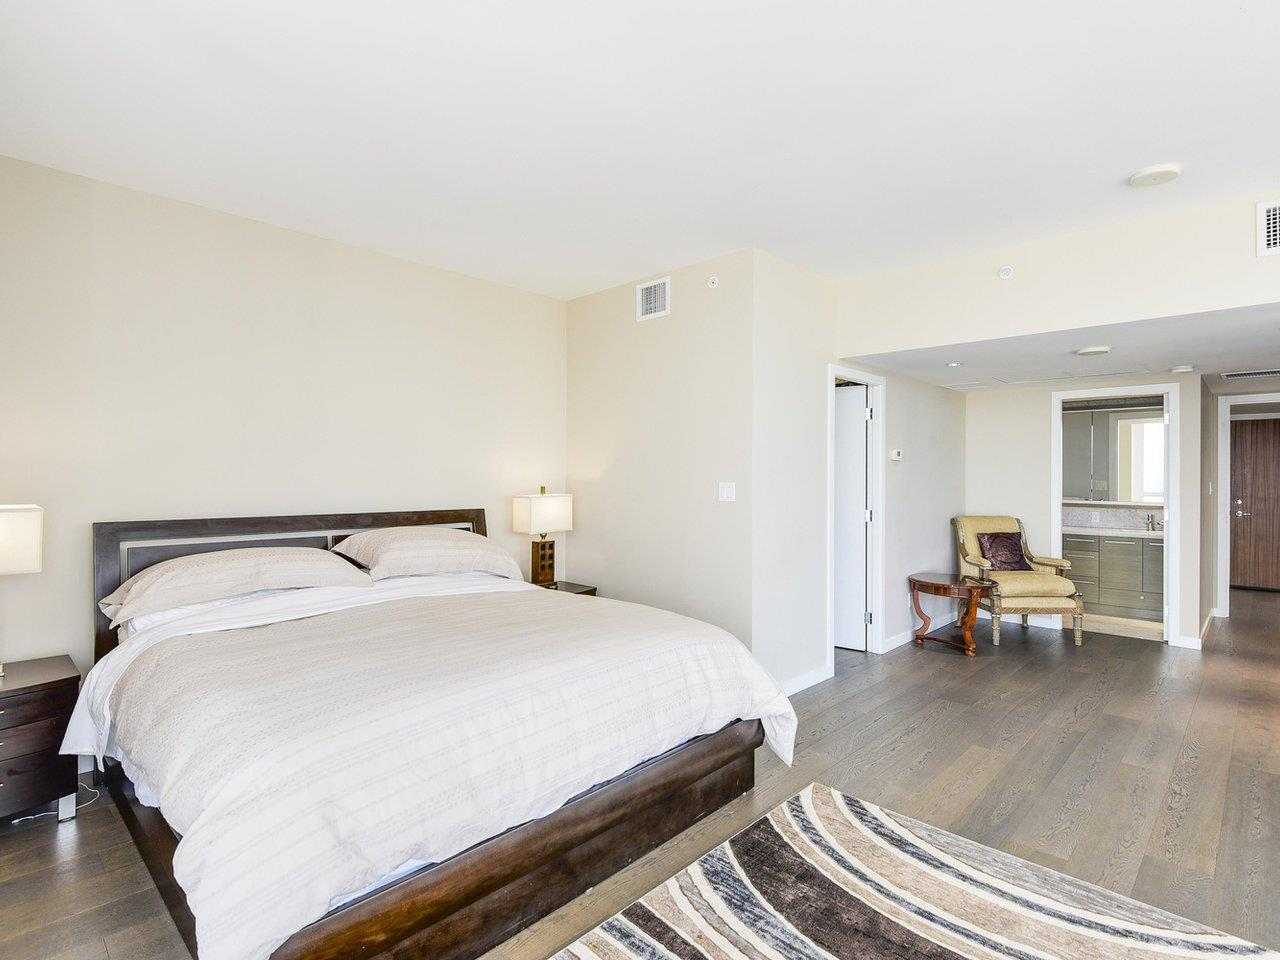 Condo Apartment at PH3 833 SEYMOUR STREET, Unit PH3, Vancouver West, British Columbia. Image 11